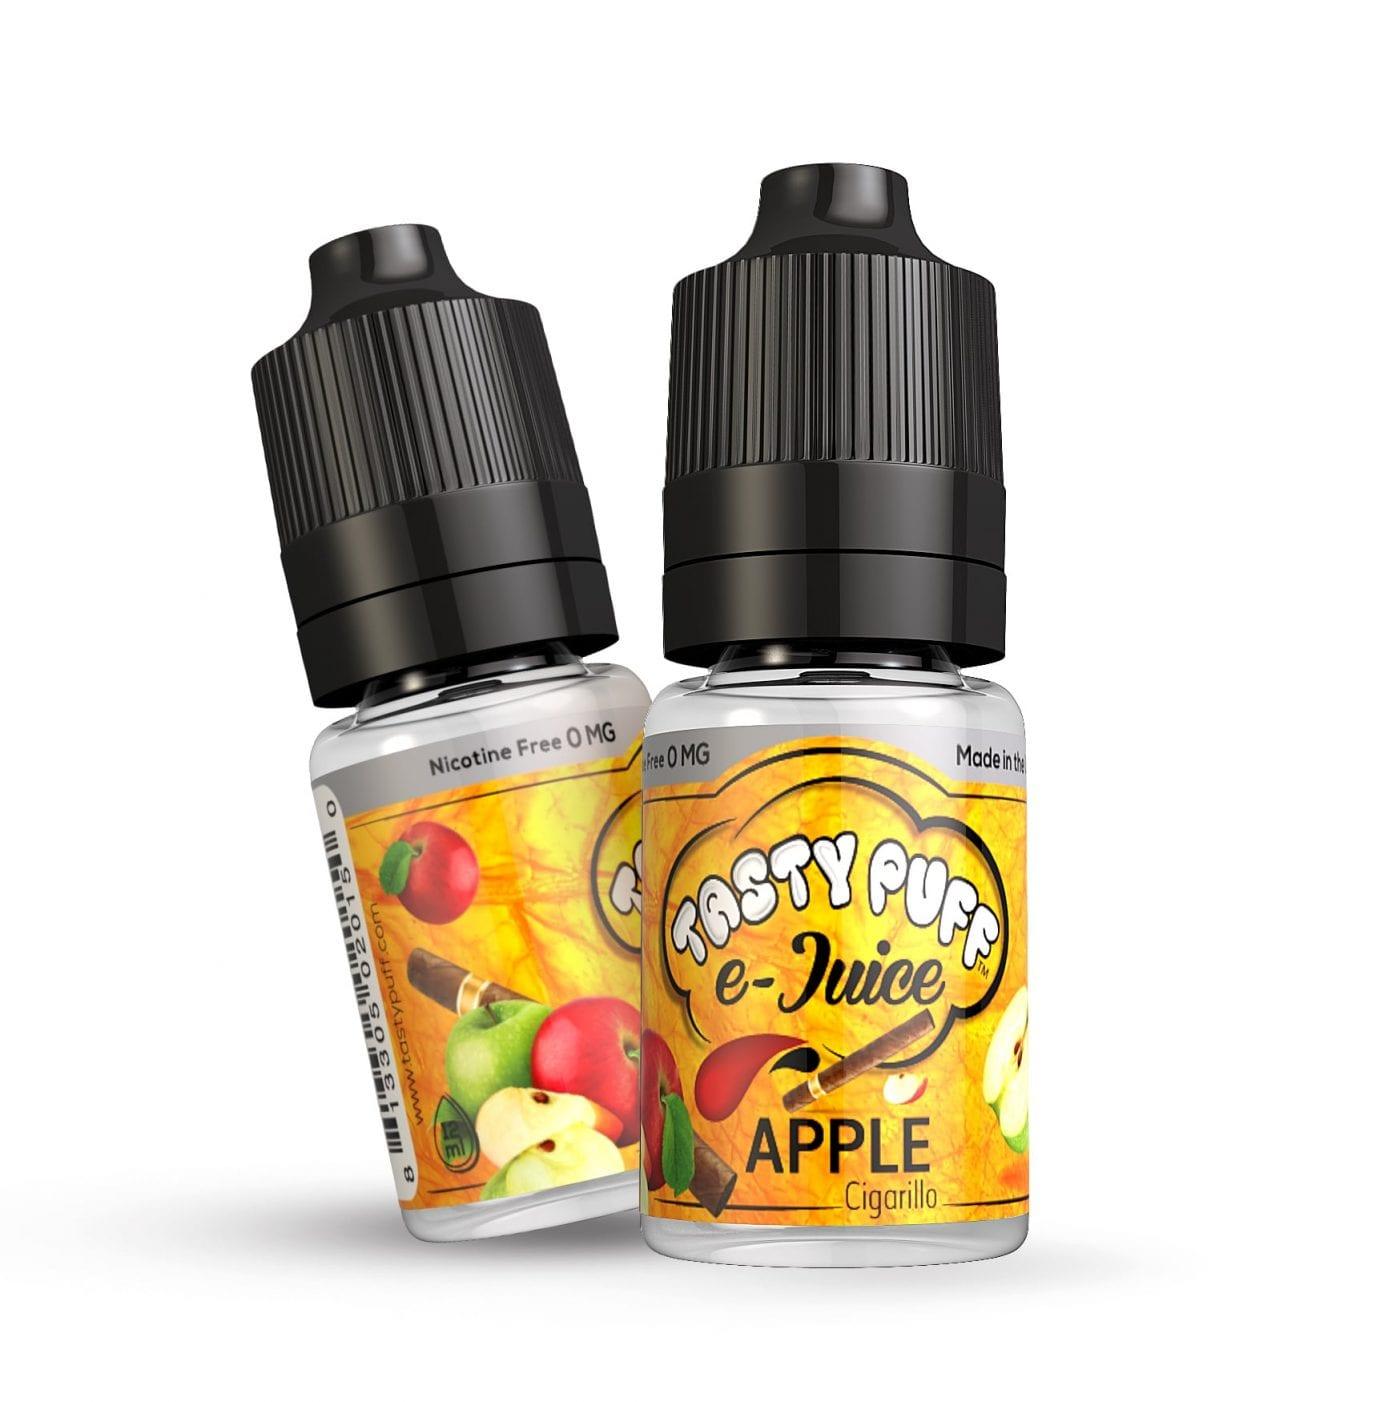 Apple Cigarillo E Juice Tasty Puff